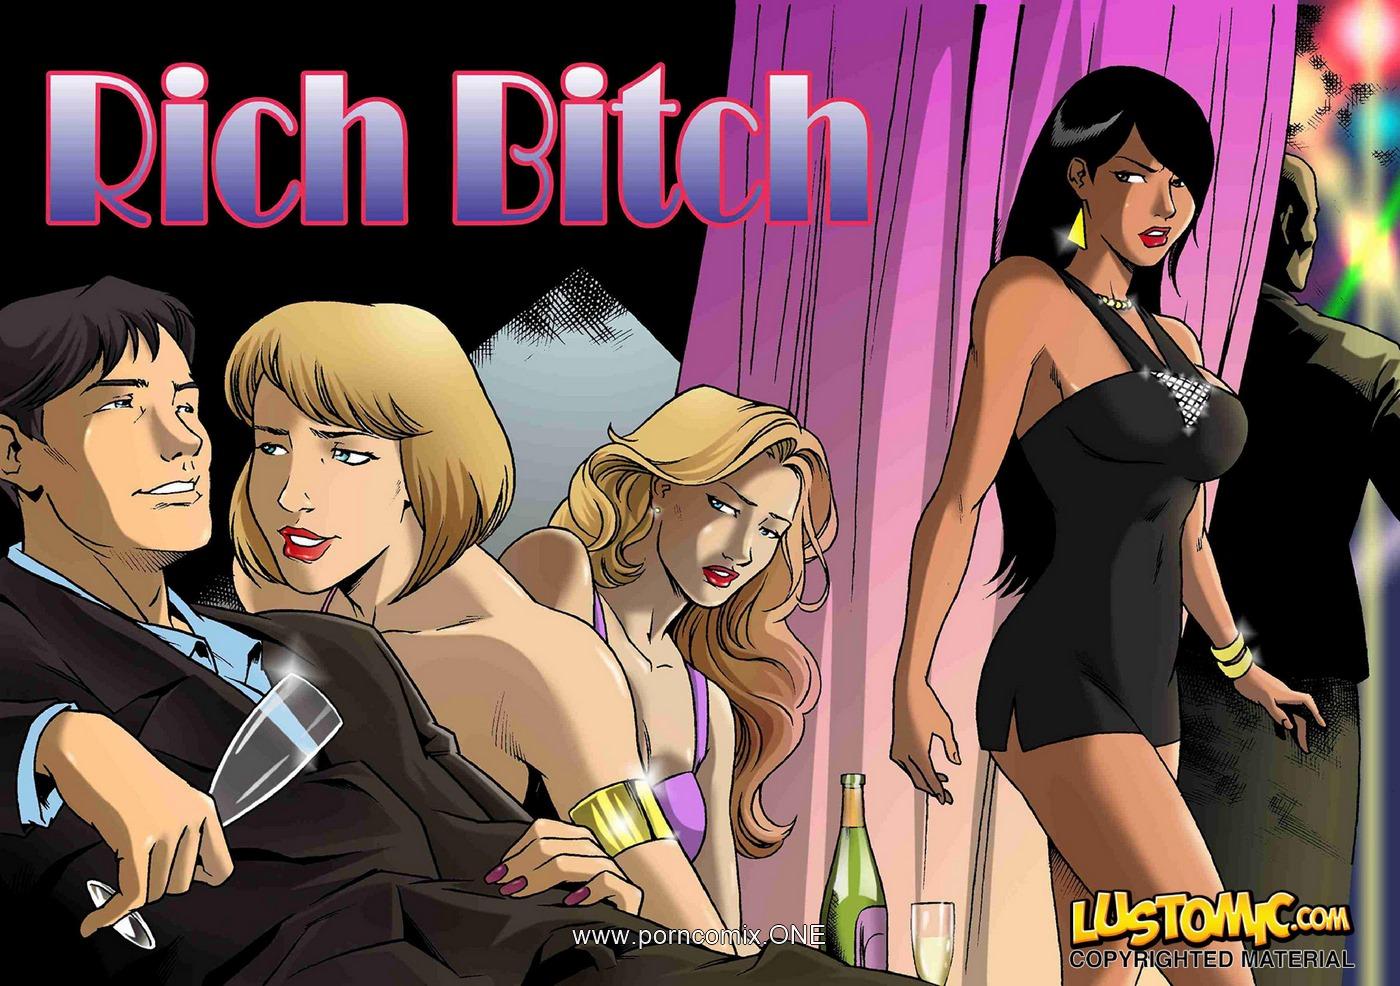 Rich Bitch- Lustomic porn comics 8 muses